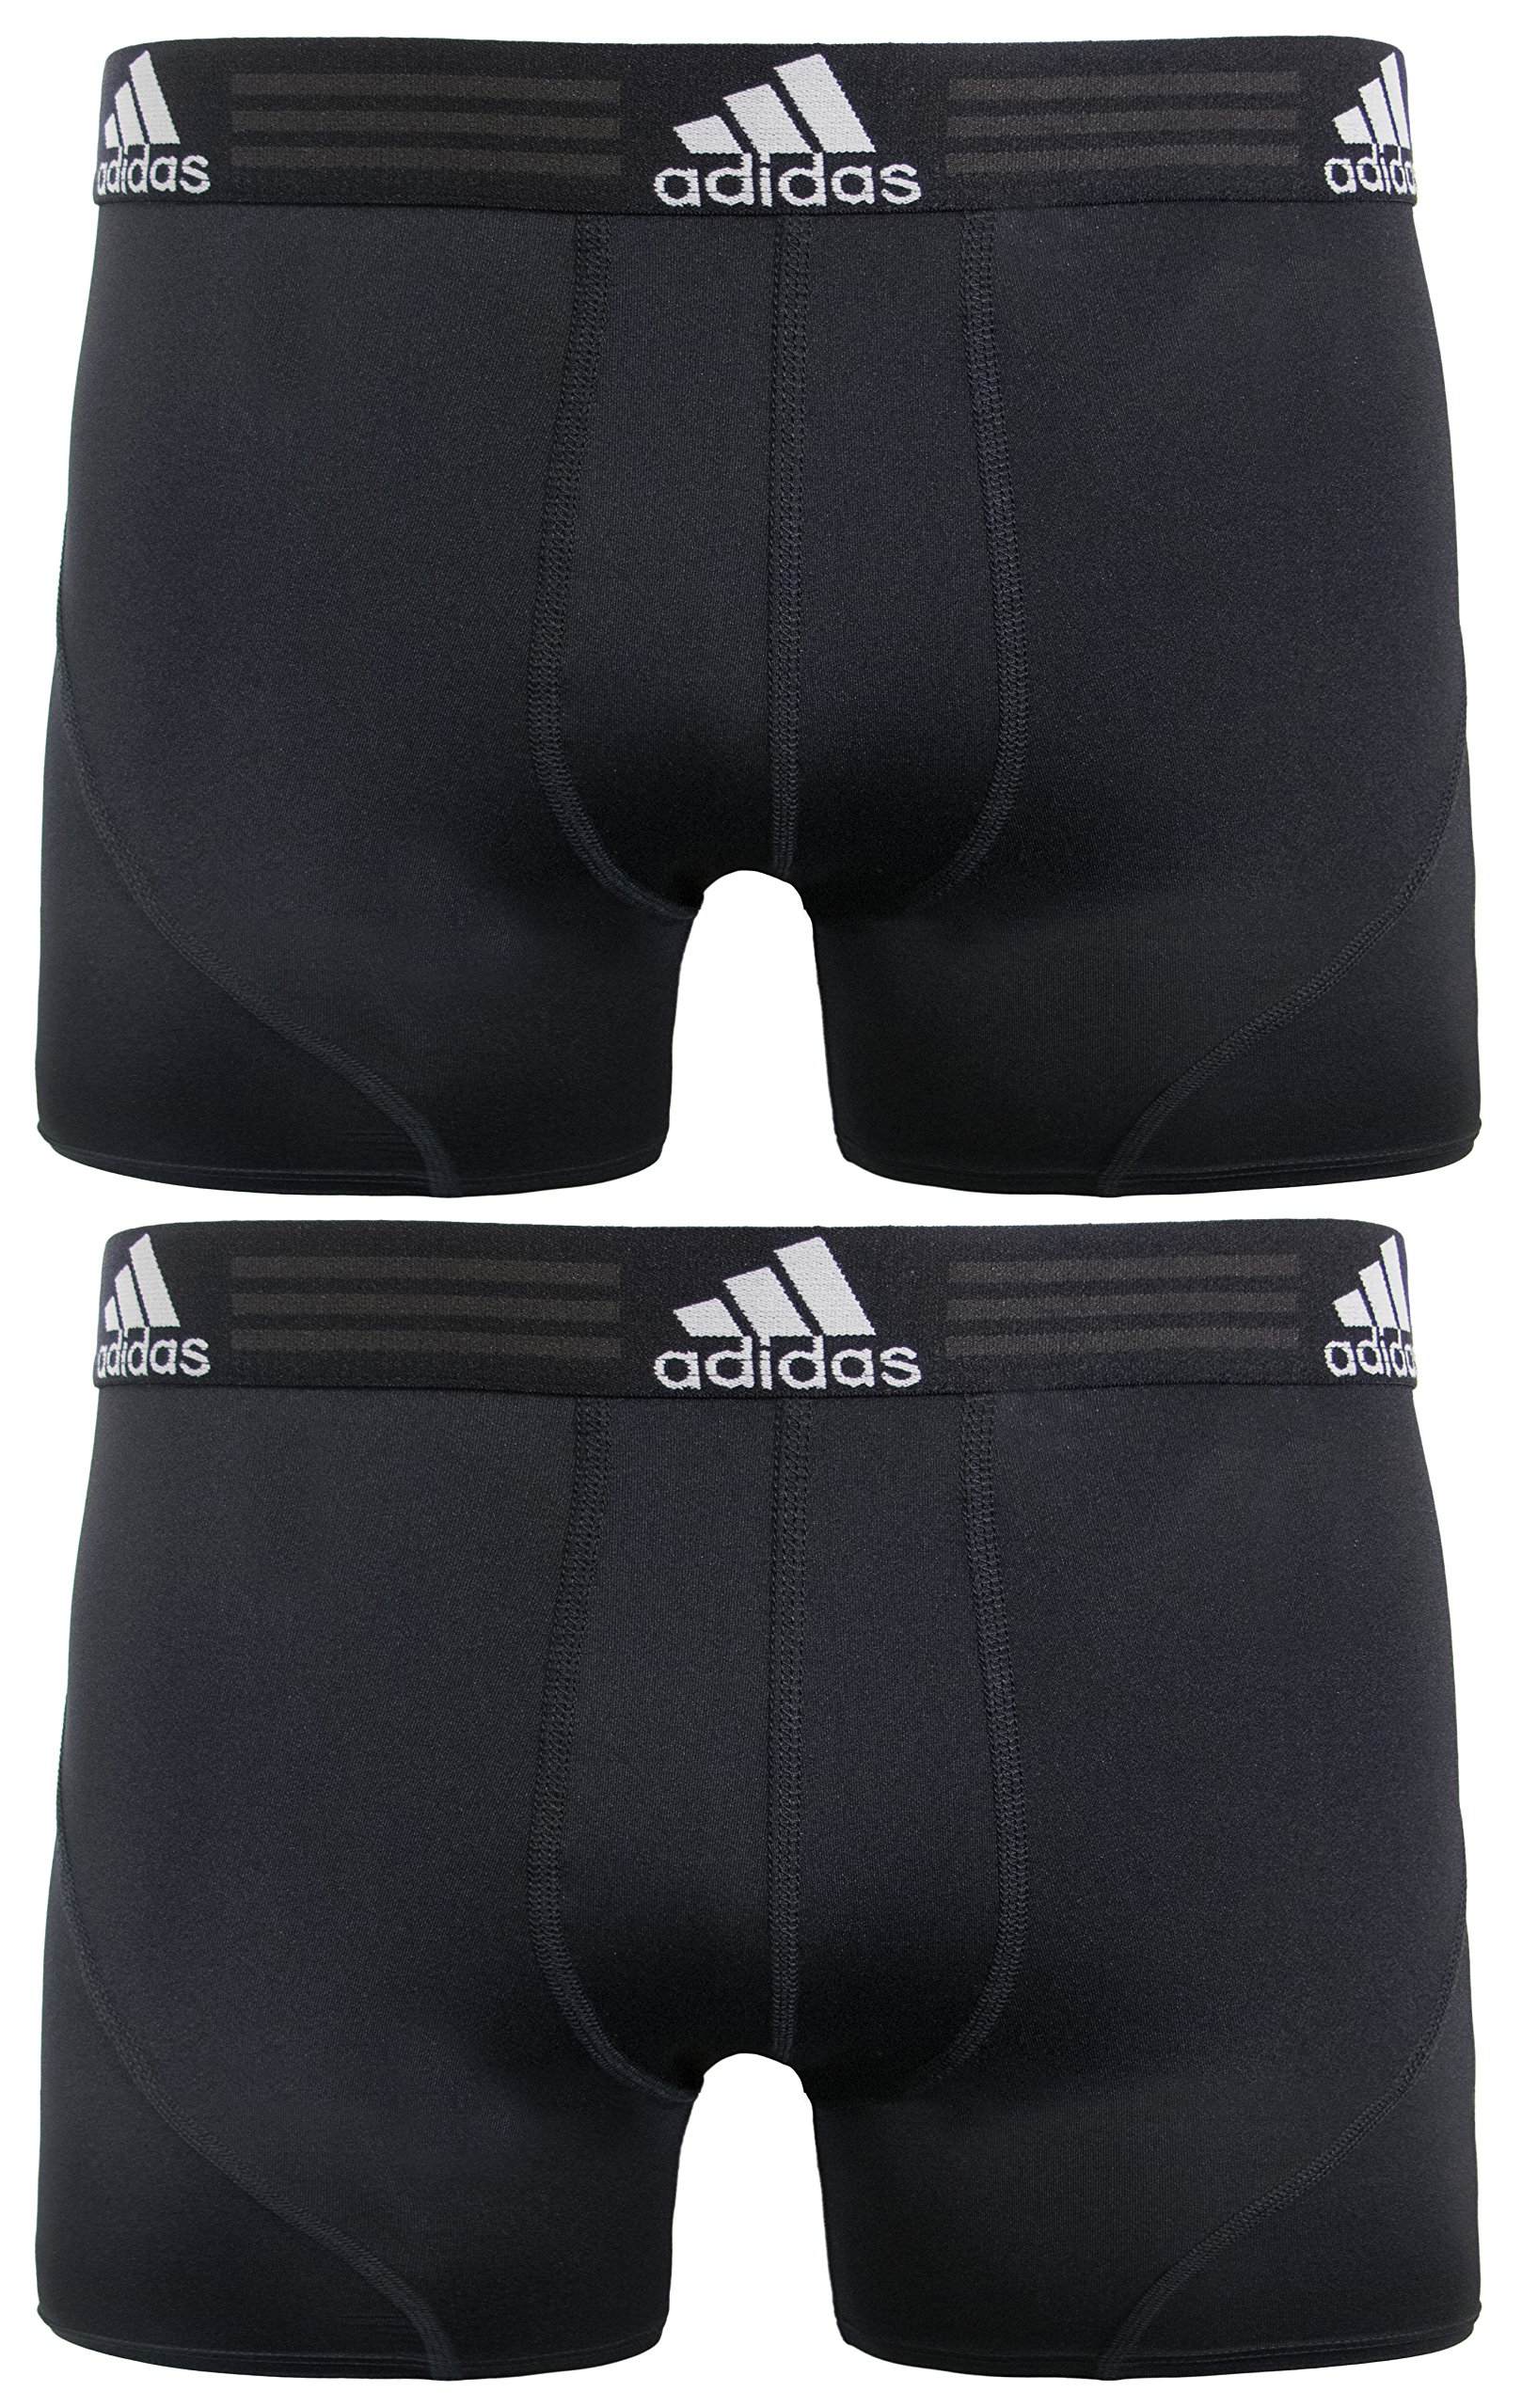 adidas Men's Sport Performance Climalite Trunks Underwear (2-Pack)